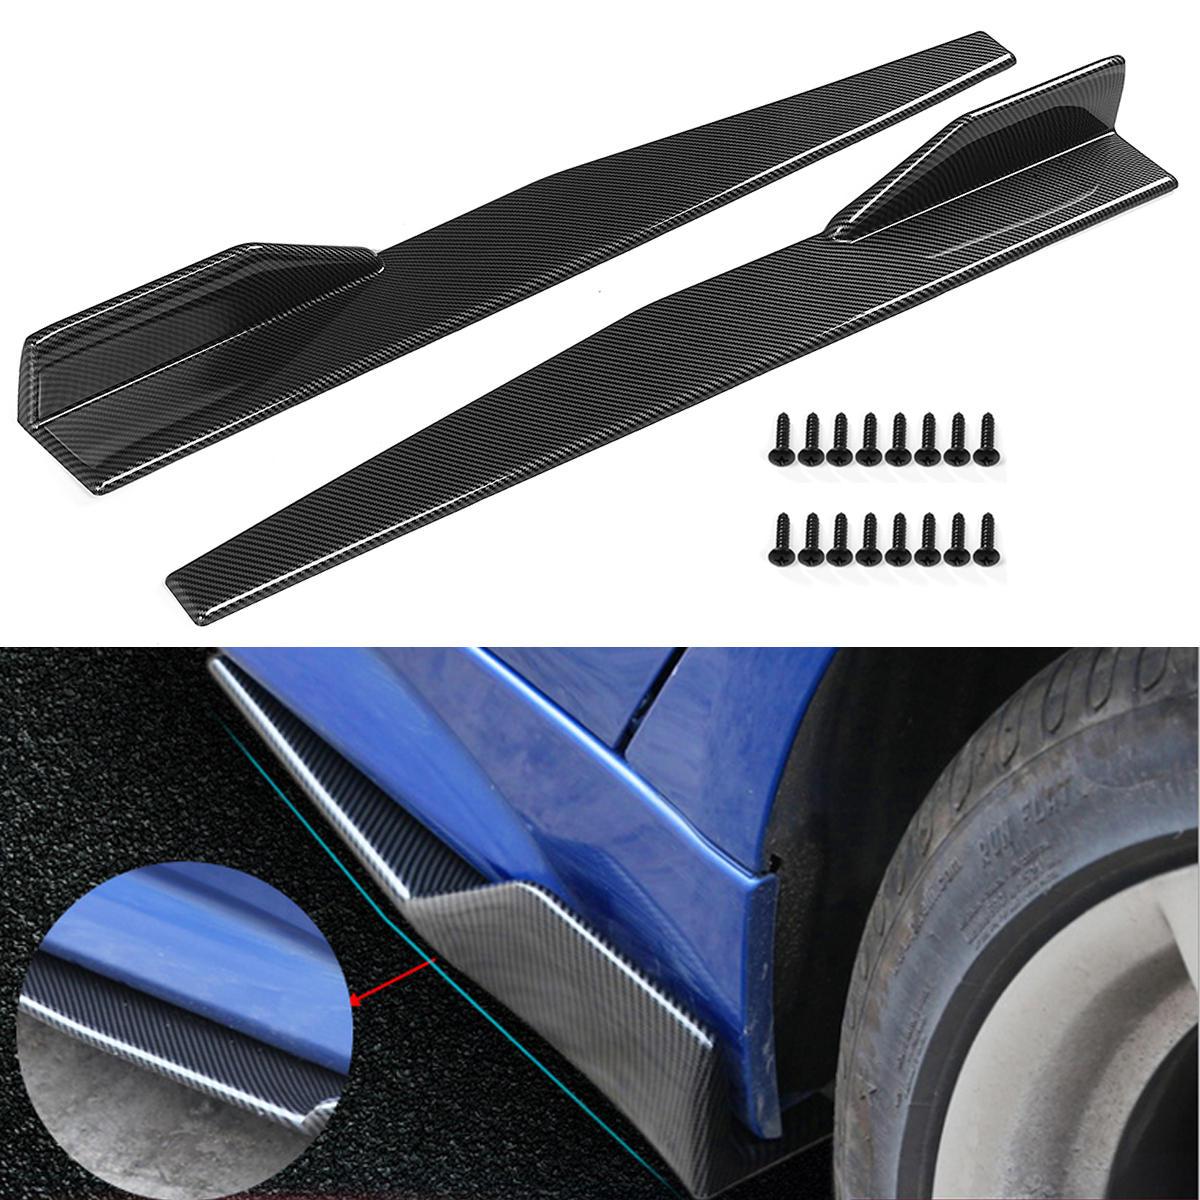 Par Carbon Fiber Modifierad Bil Sidokjol Rocker Splitters Diffuser Winglet Wings Bumper Protector 86CM Universal